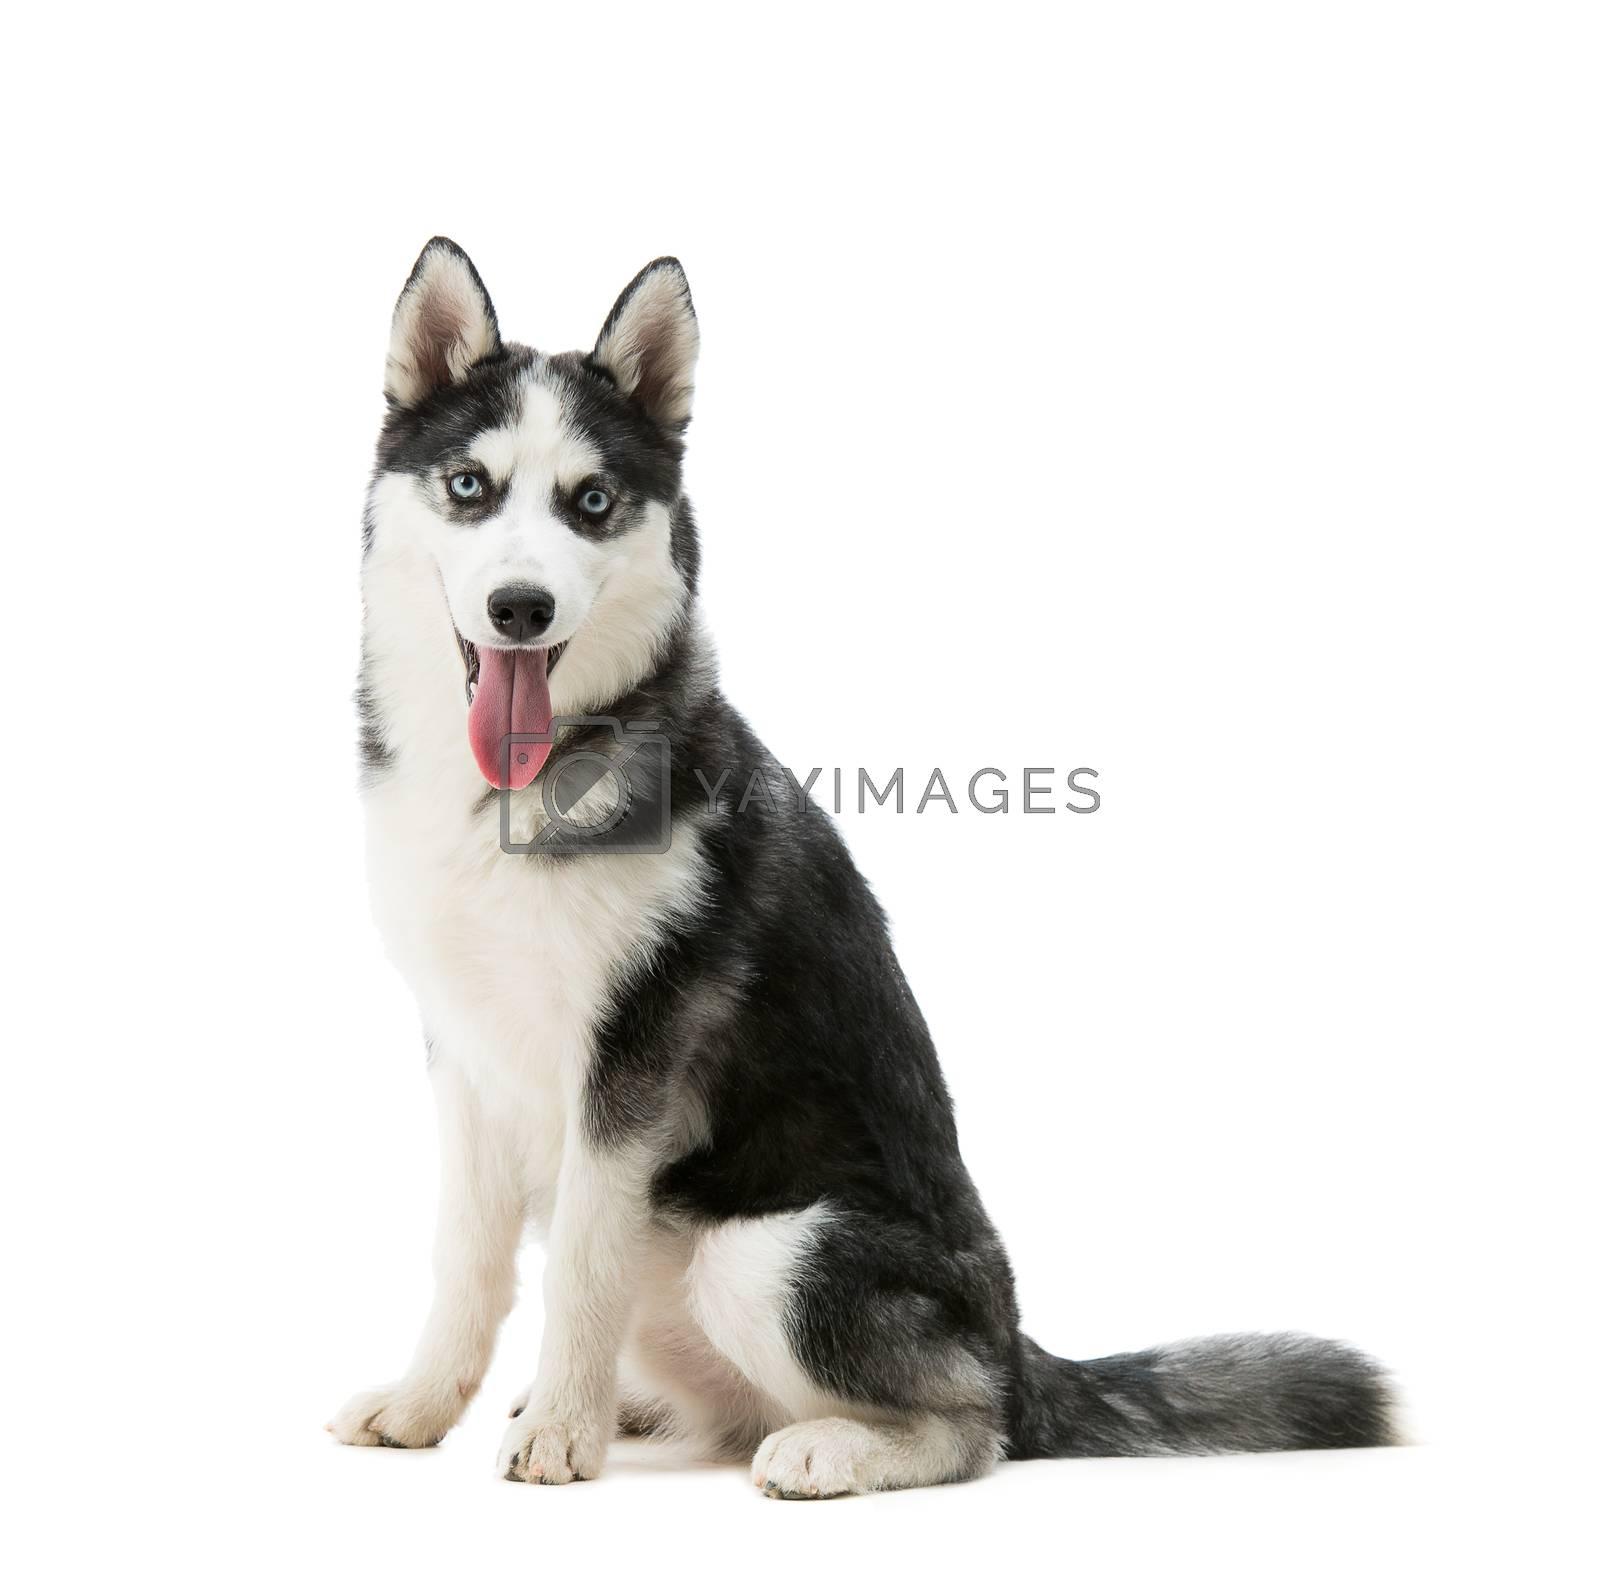 Royalty free image of Husky dog breed by GekaSkr